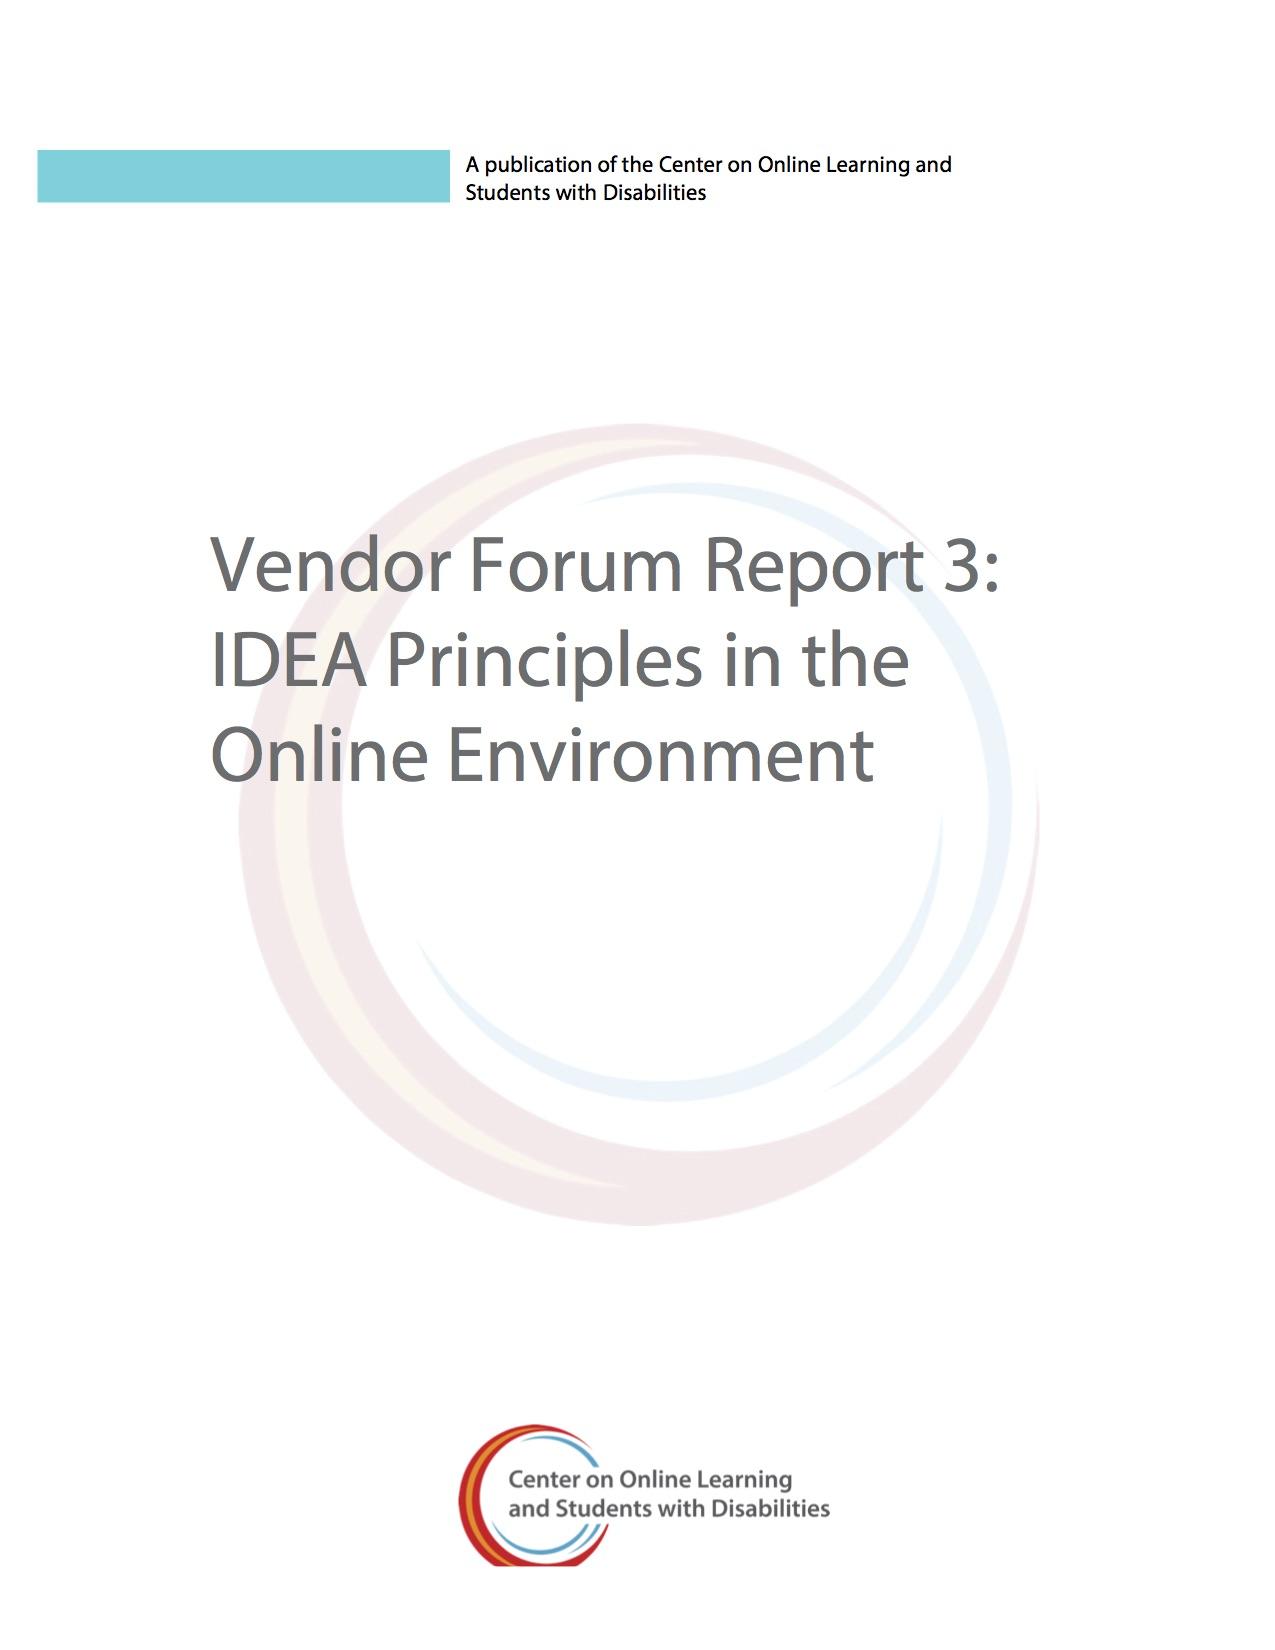 Vendor Forum Report 3: IDEA Principles In The Online Environment